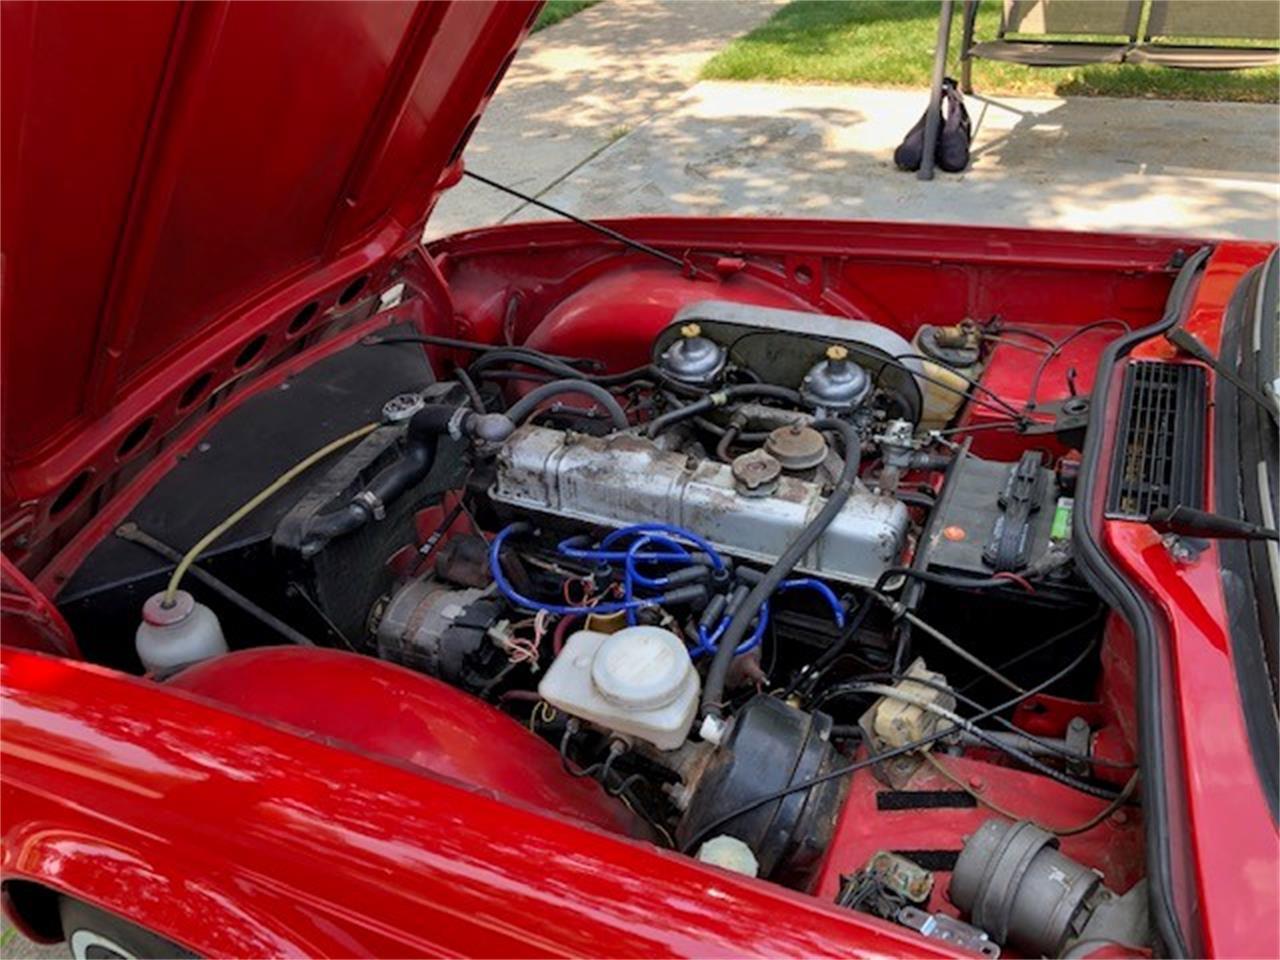 1976 Triumph TR6 (CC-1358173) for sale in Cedarburg, Wisconsin